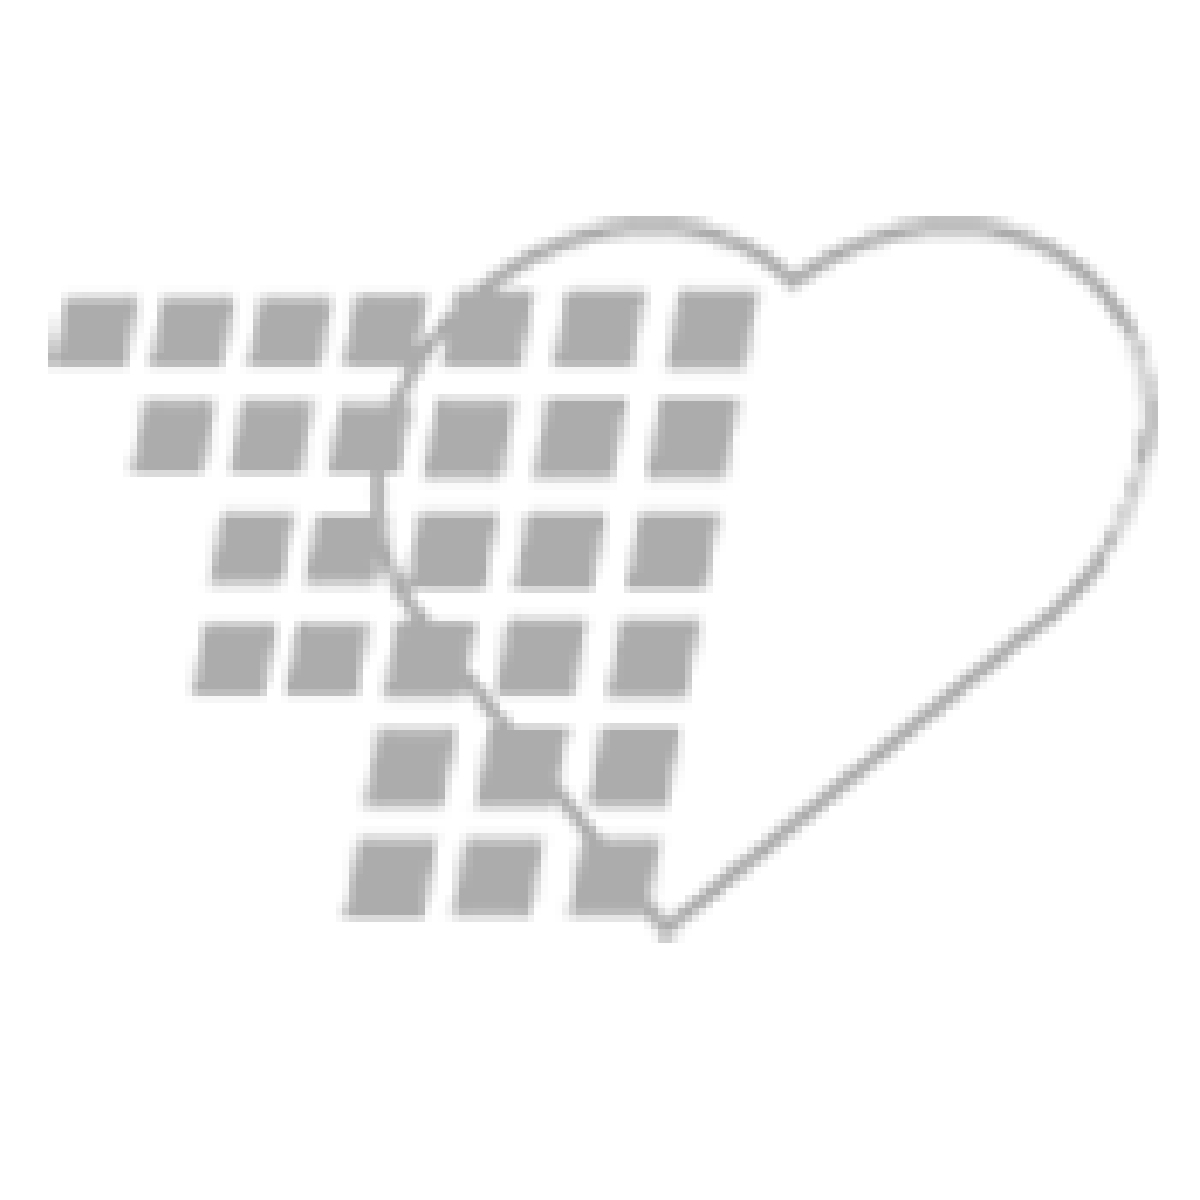 05-84-1707-RZBRY - Ribcord Bedspread - Raspberry